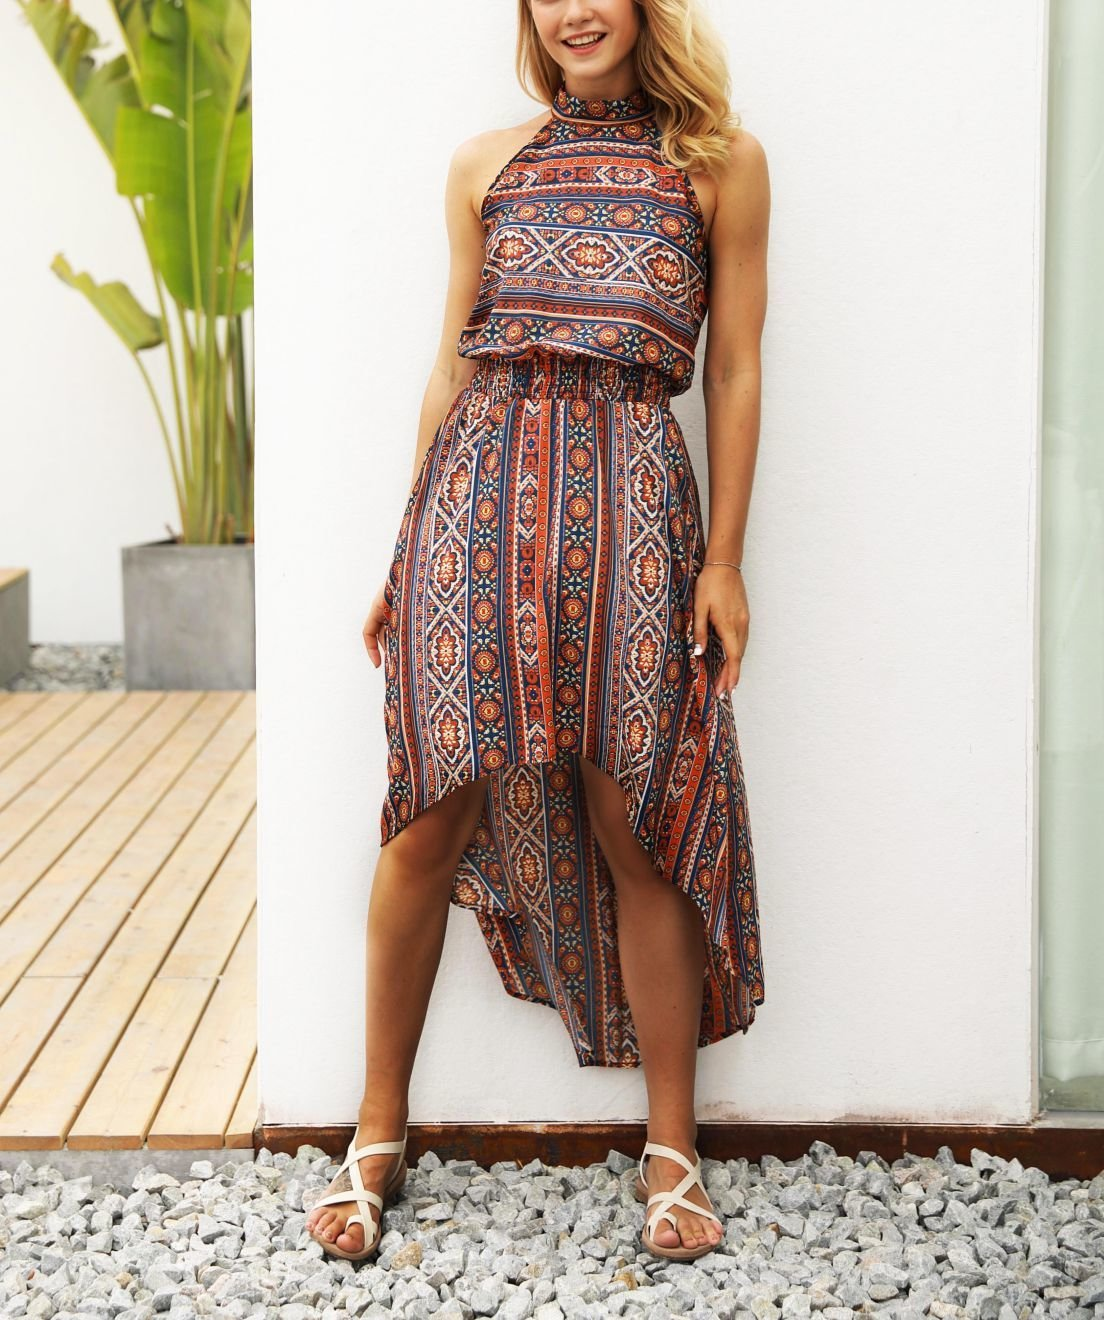 Summer Halter Dress in Geometric Print